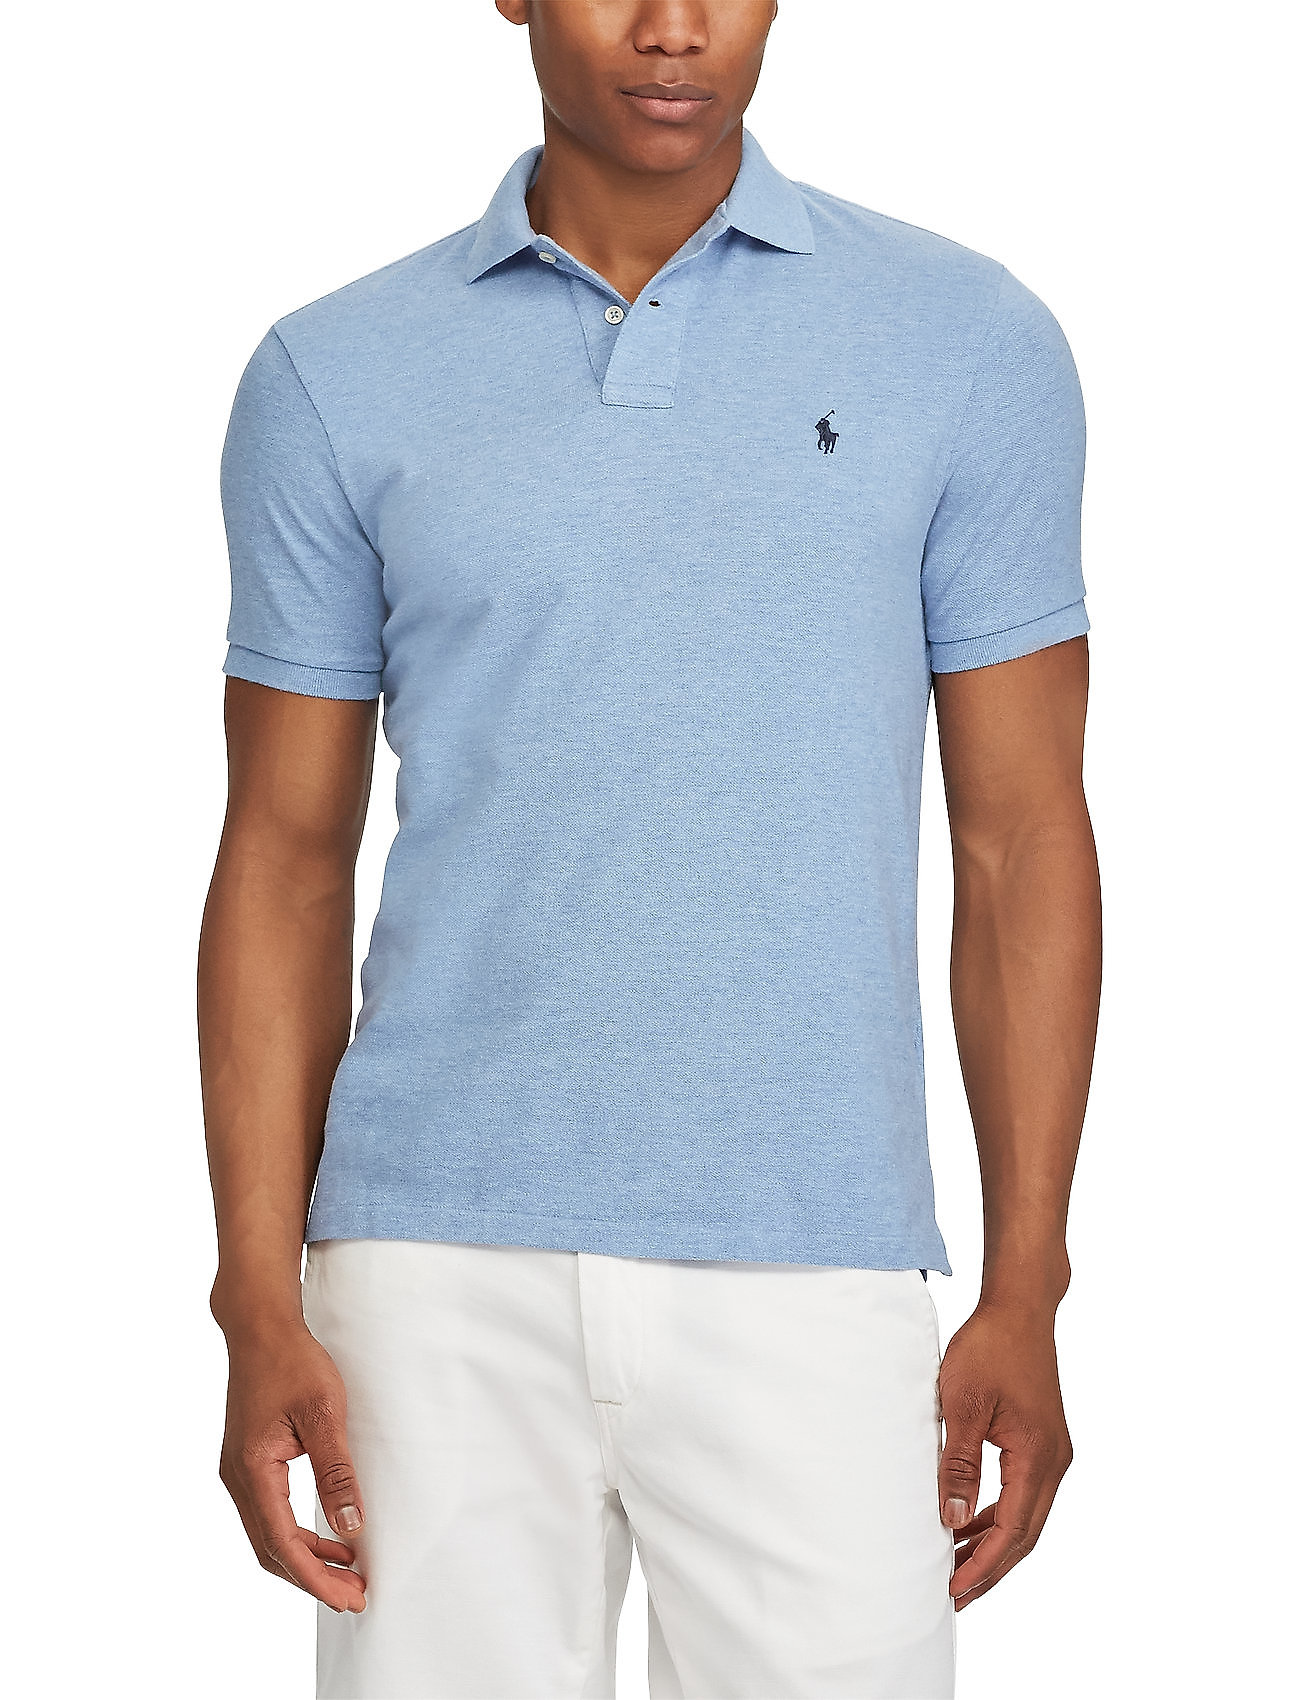 Slim Fit Mesh Polo Shirt (Jamaica Heather) (99 €) - Polo Ralph Lauren - |  Boozt.com